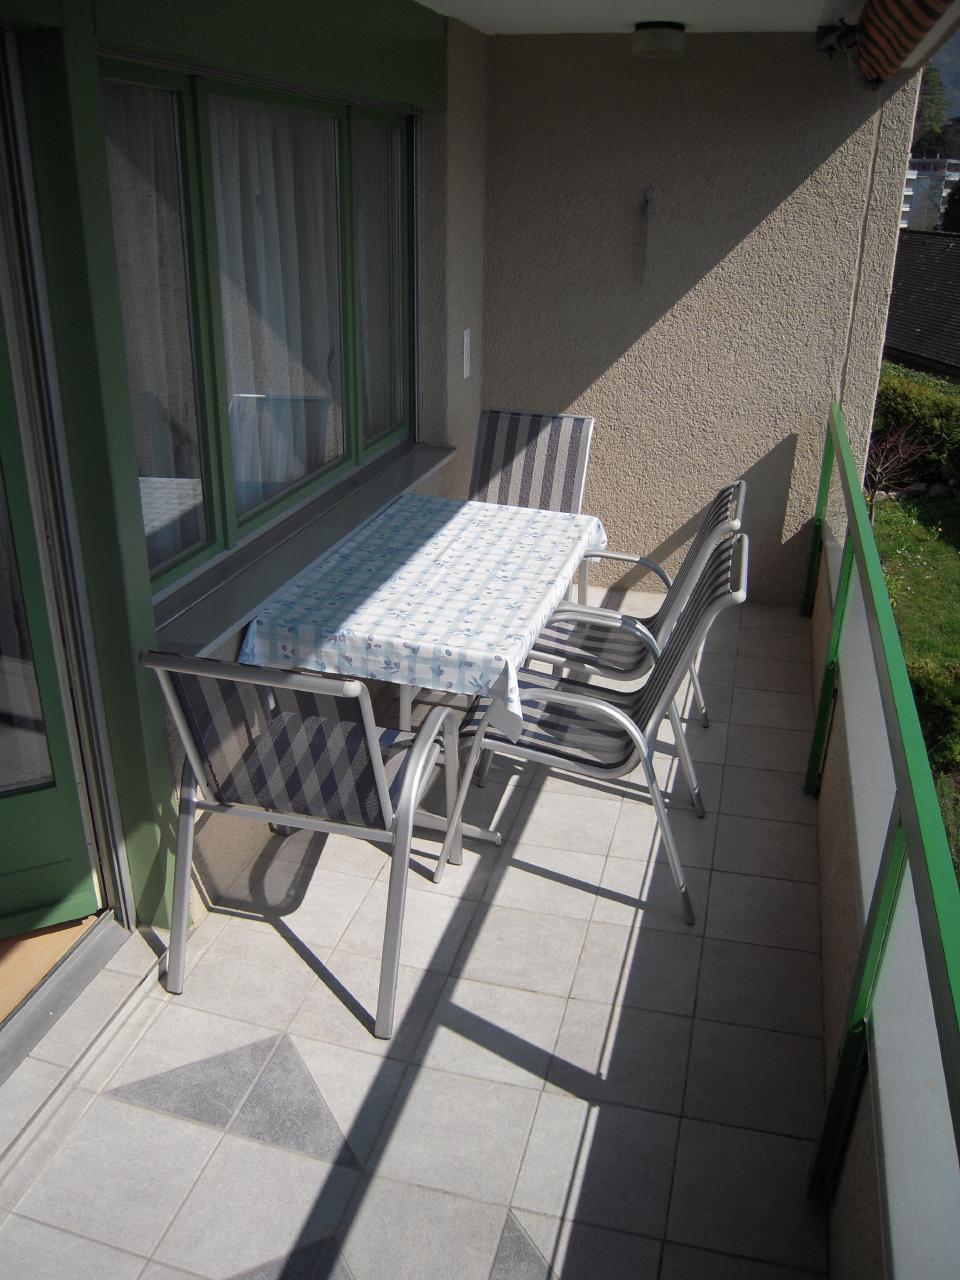 Holiday apartment Appartement Alpenblick / F5 (420340), Weggis, Weggis - Vitznau - Rigi, Central Switzerland, Switzerland, picture 10